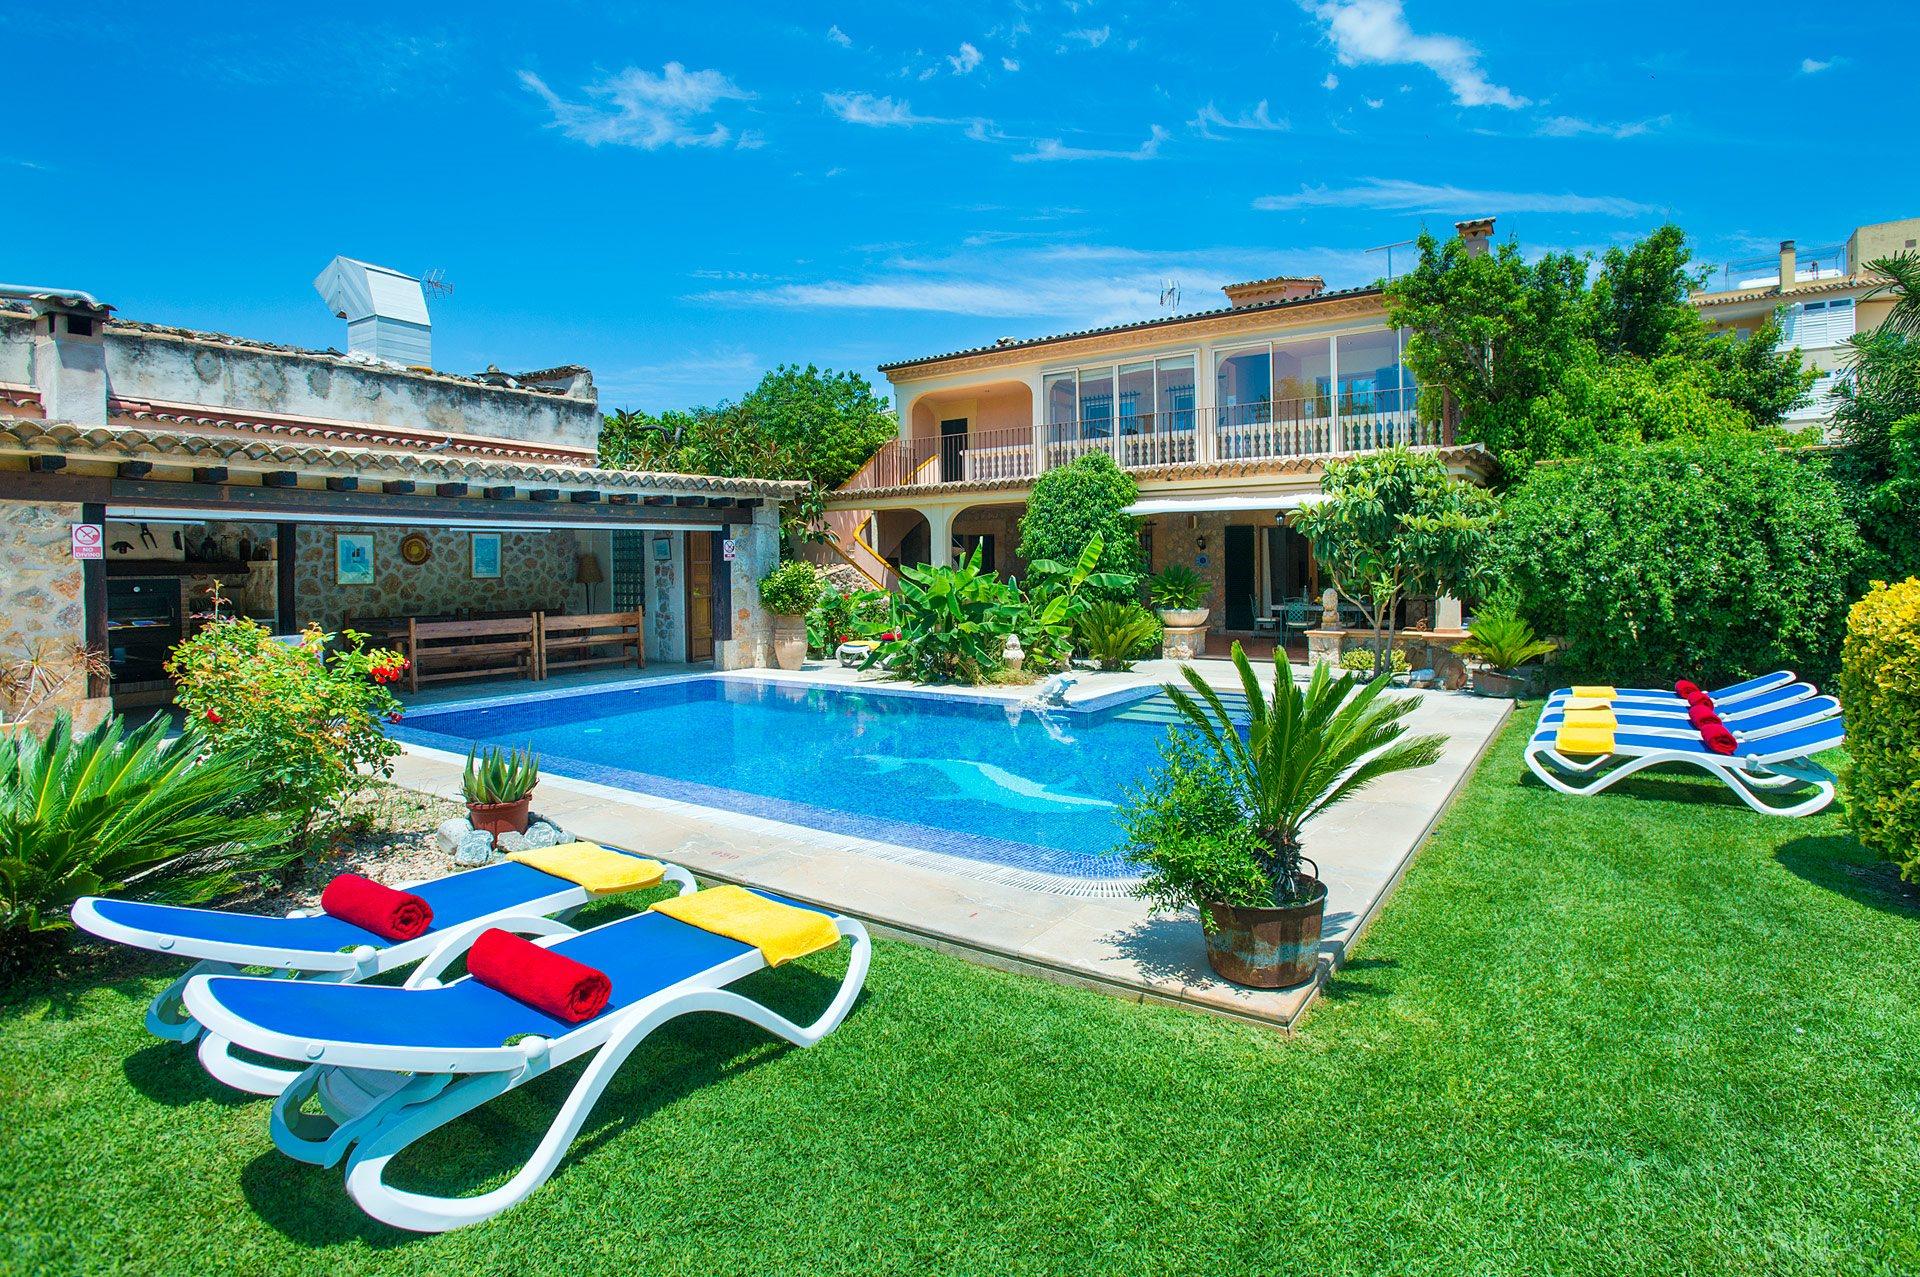 Villa Josep, Pollensa, Majorca, Spain